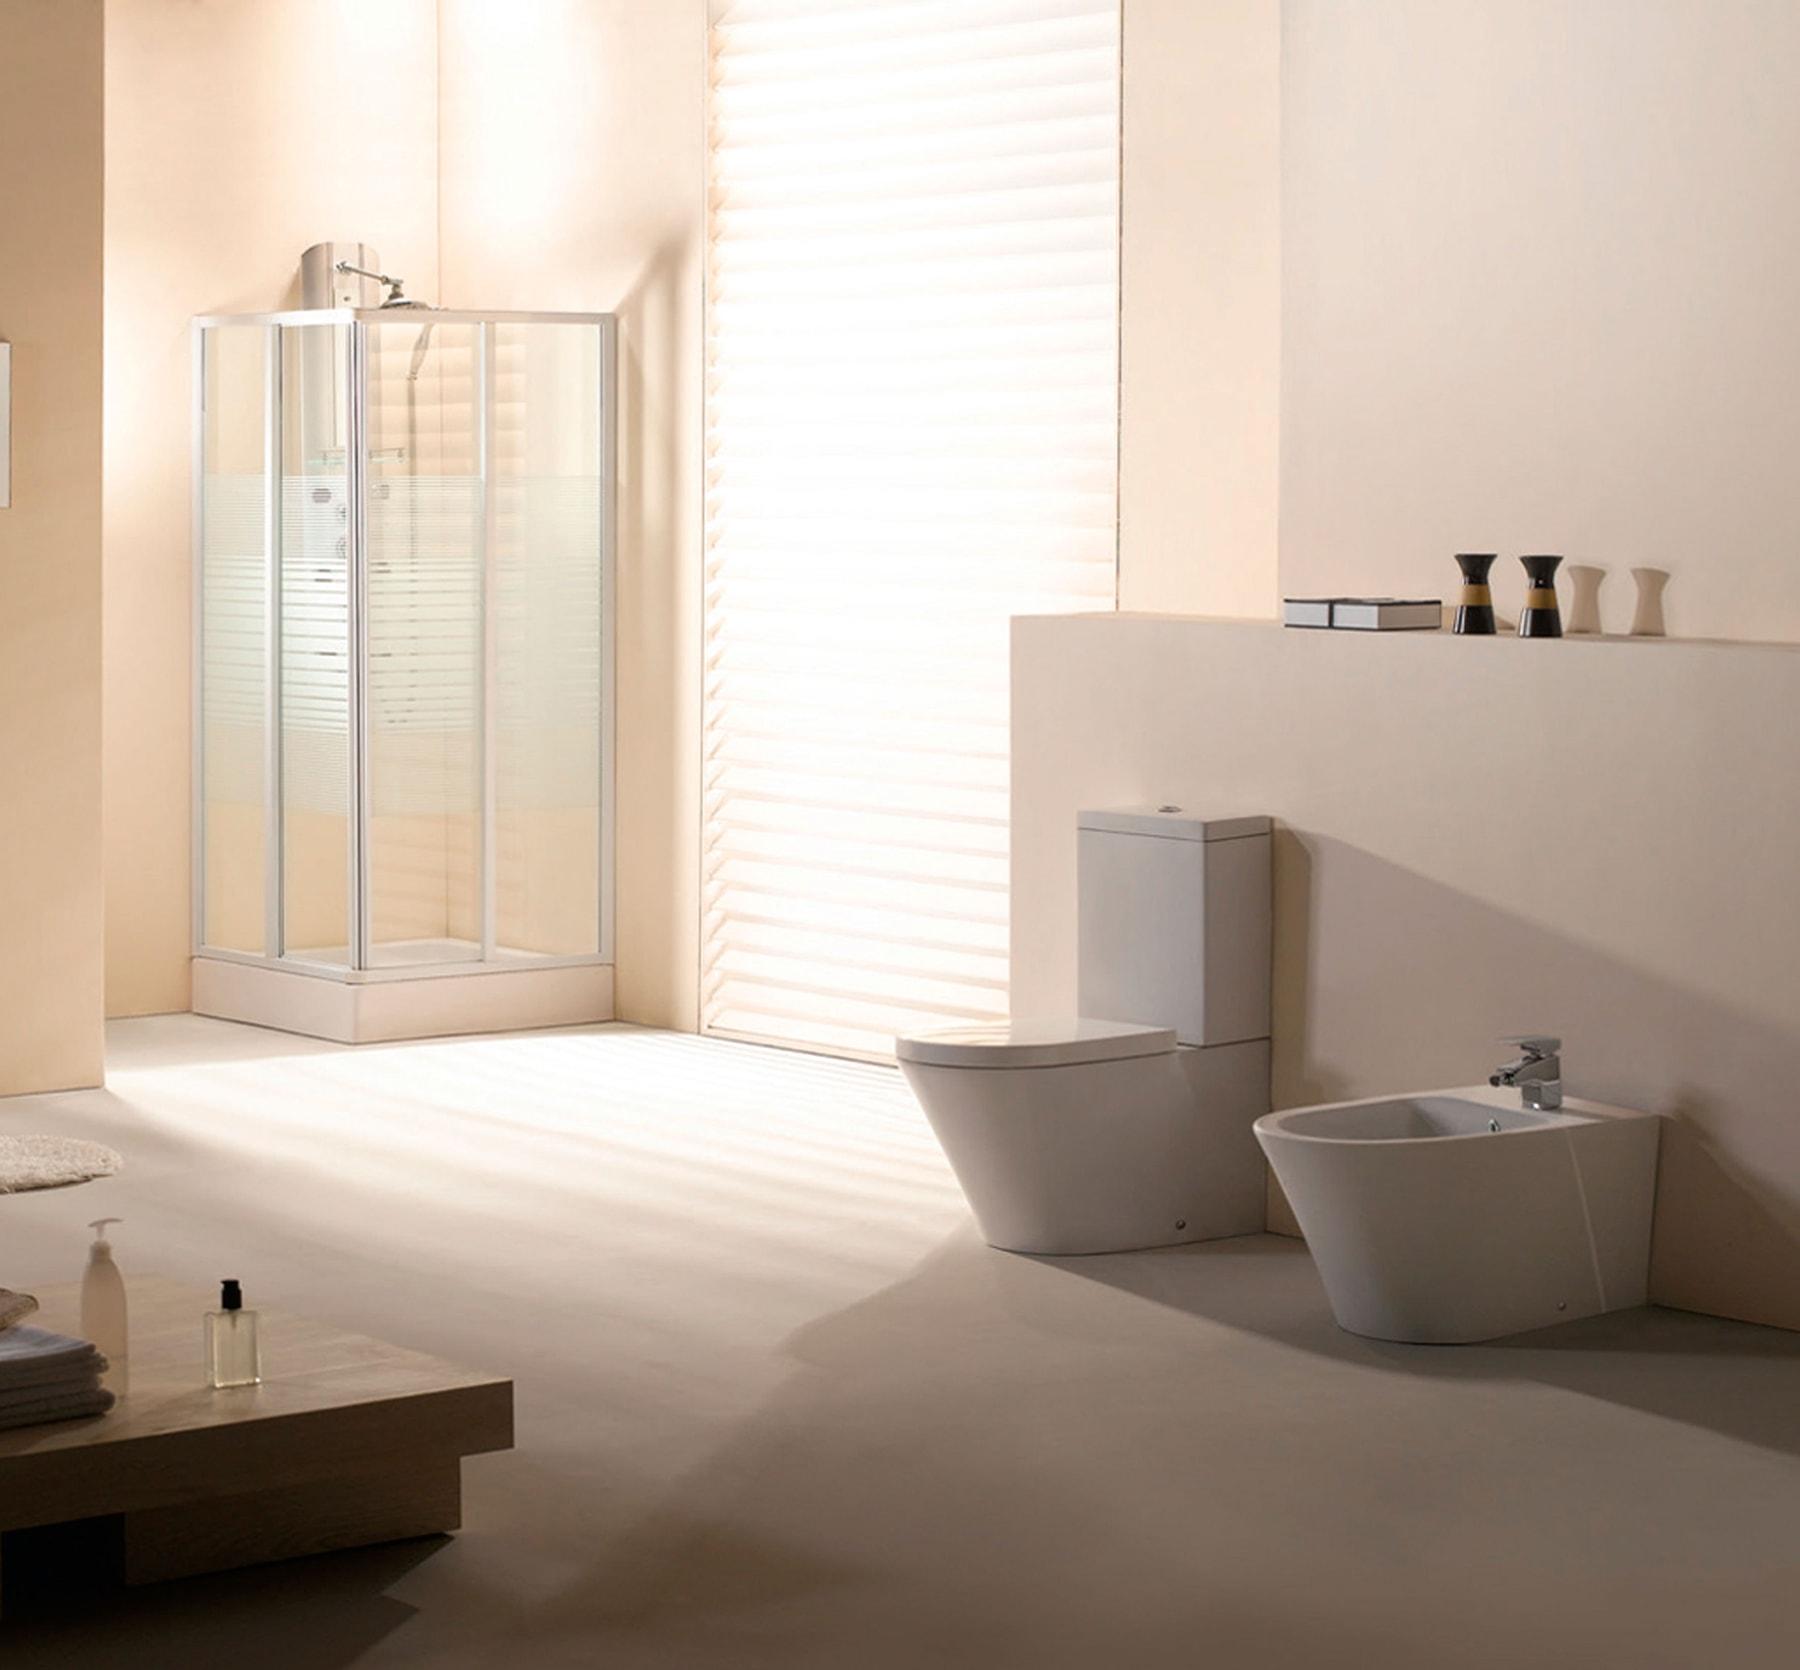 Del baño Home Slide 3